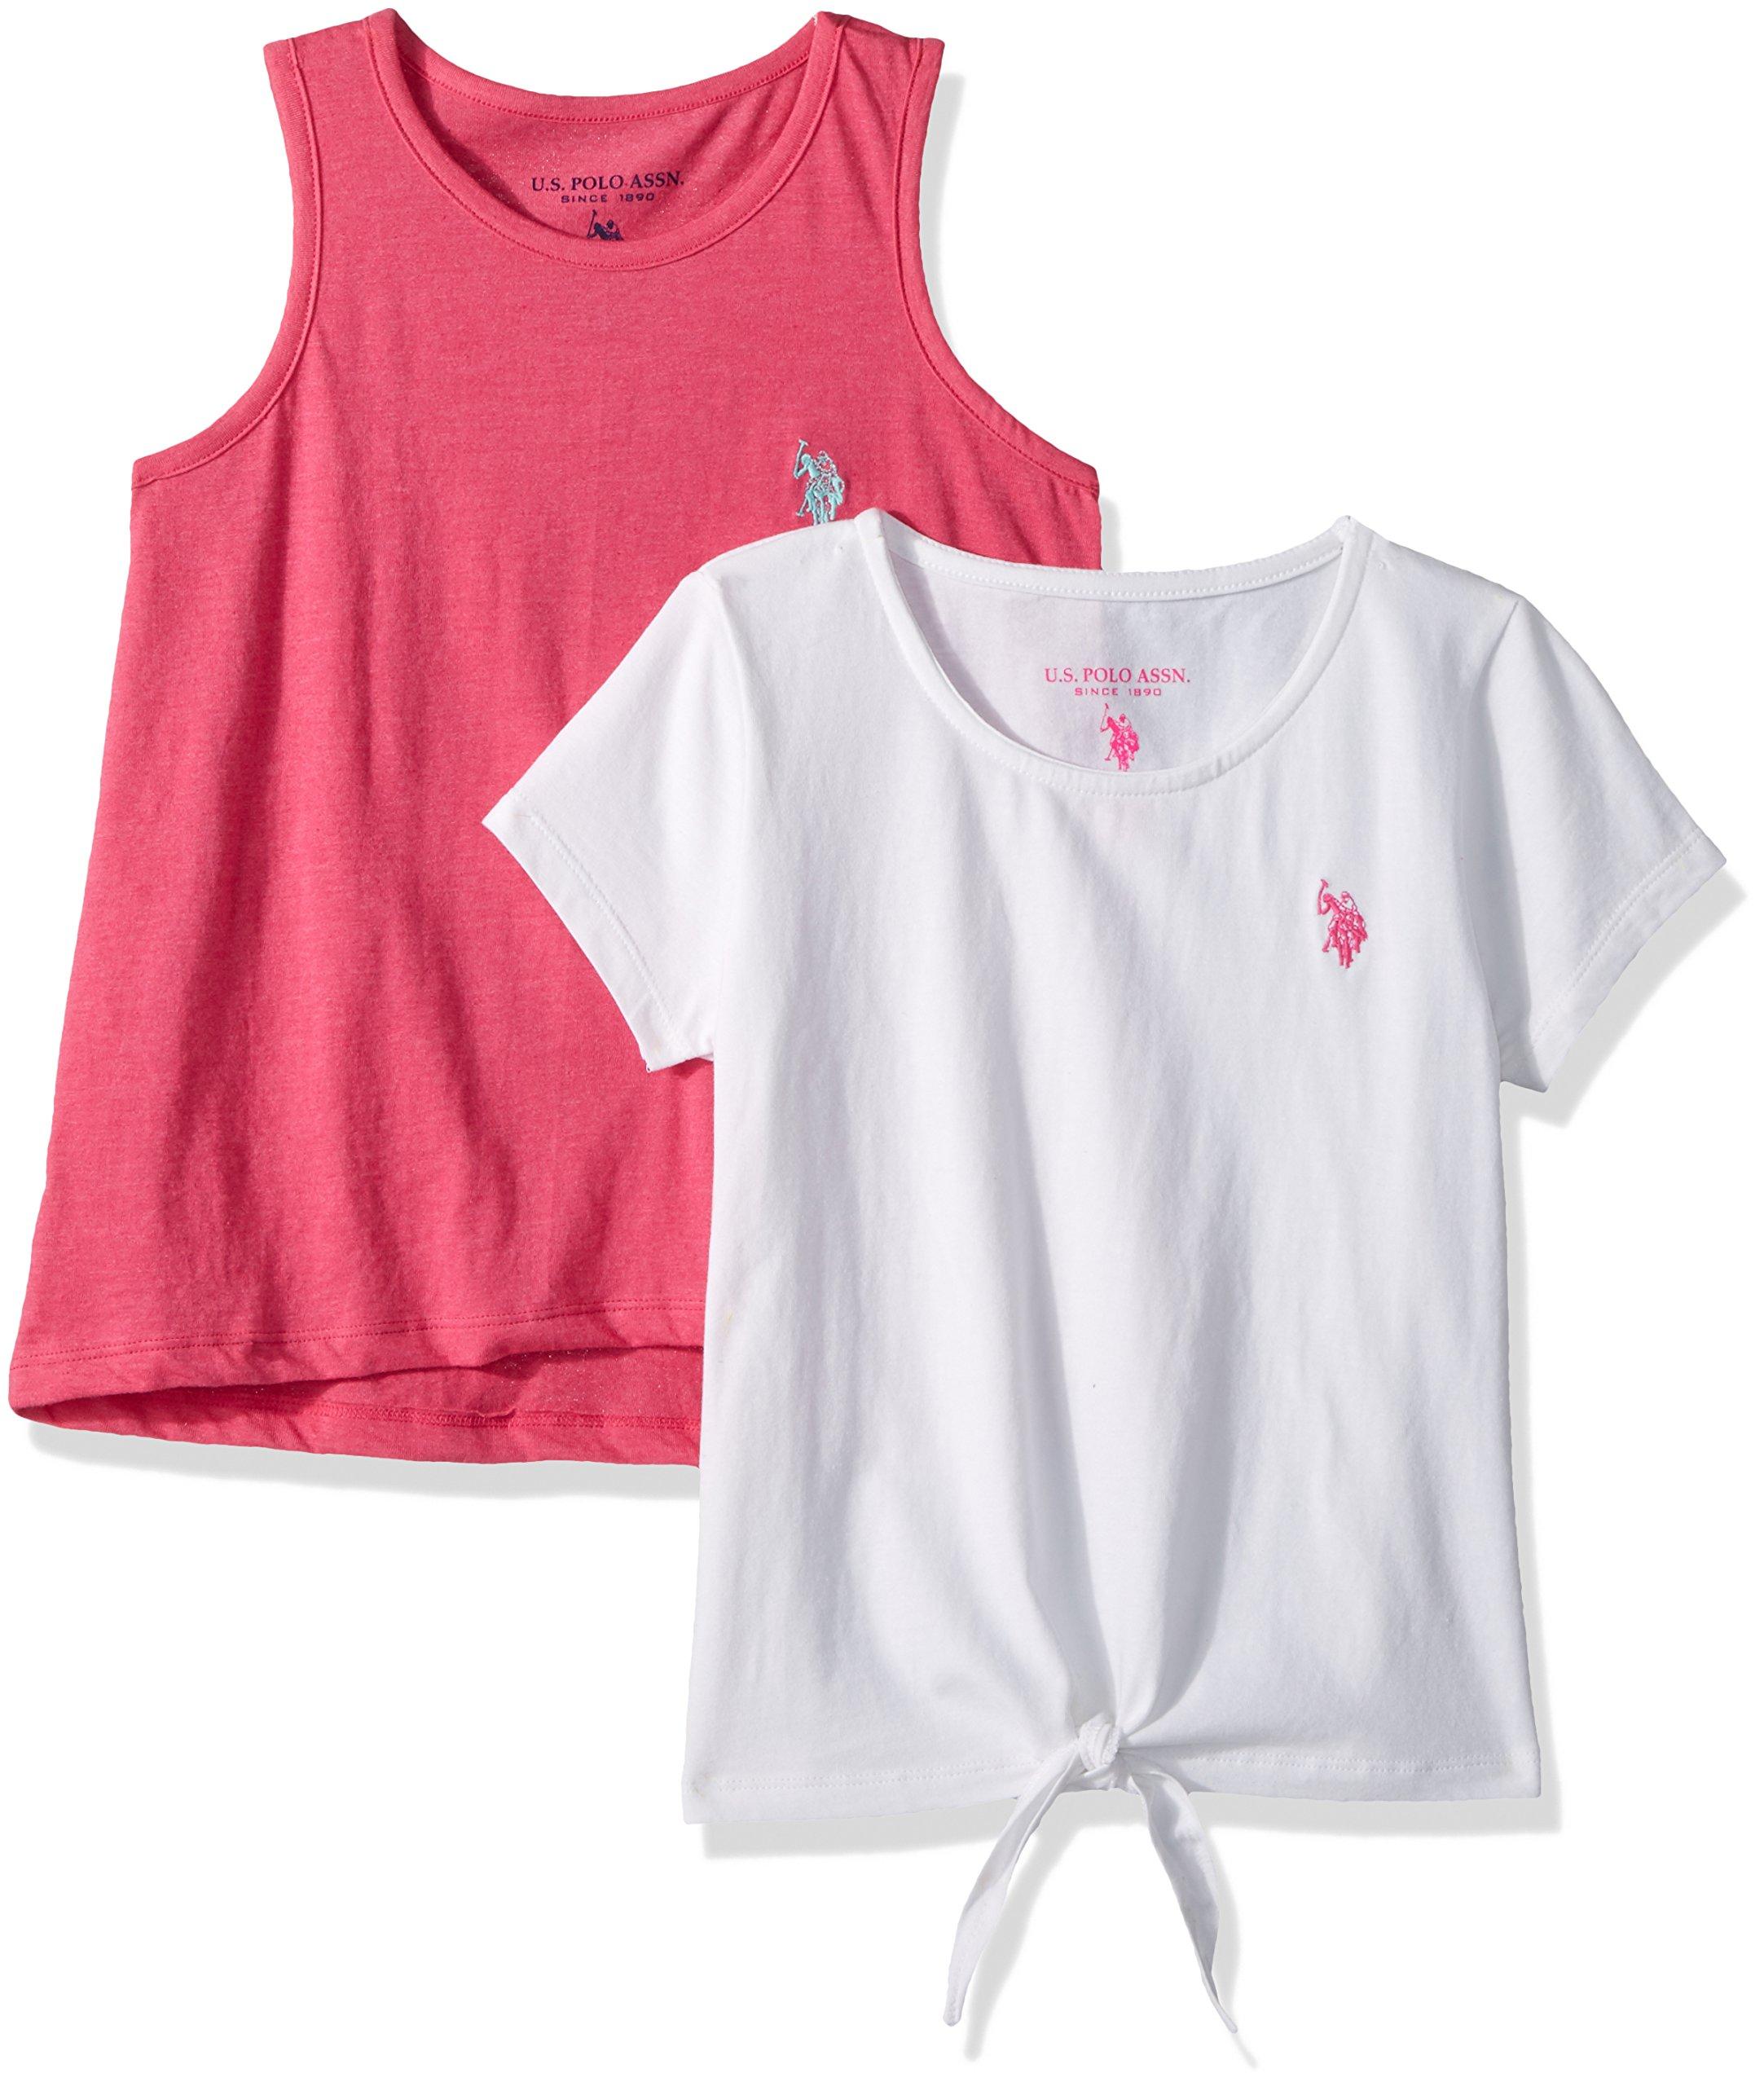 U.S. Polo Assn. Big Girls' T-Shirt and Tank Shirt Pack, Neon Hot Pink Tank White El Multi, 14/16